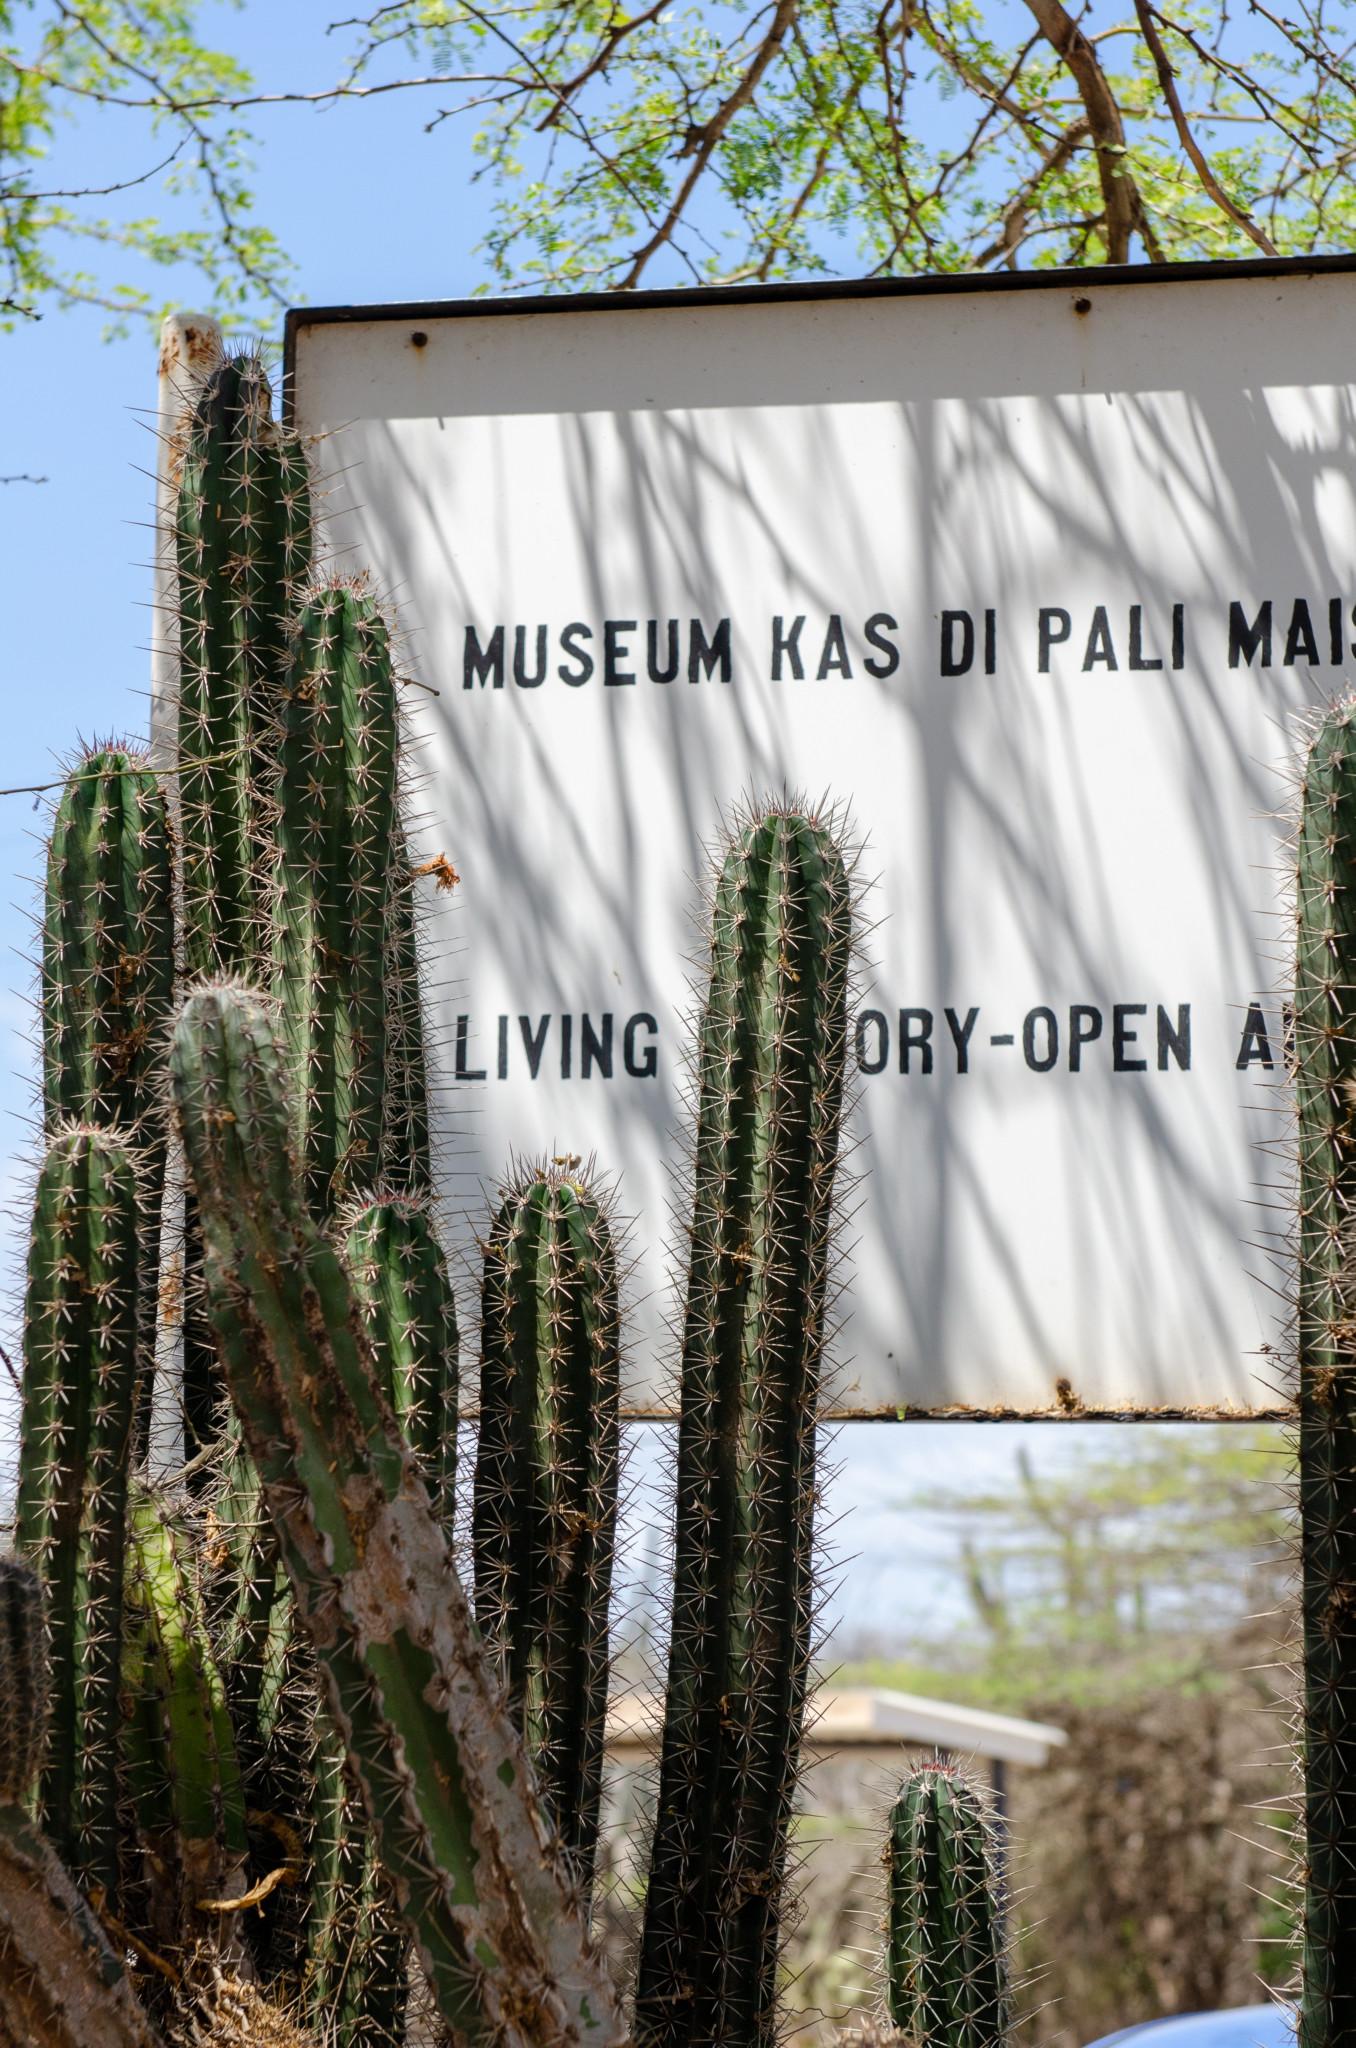 Kas di Pali Maishi Museum auf Curacao